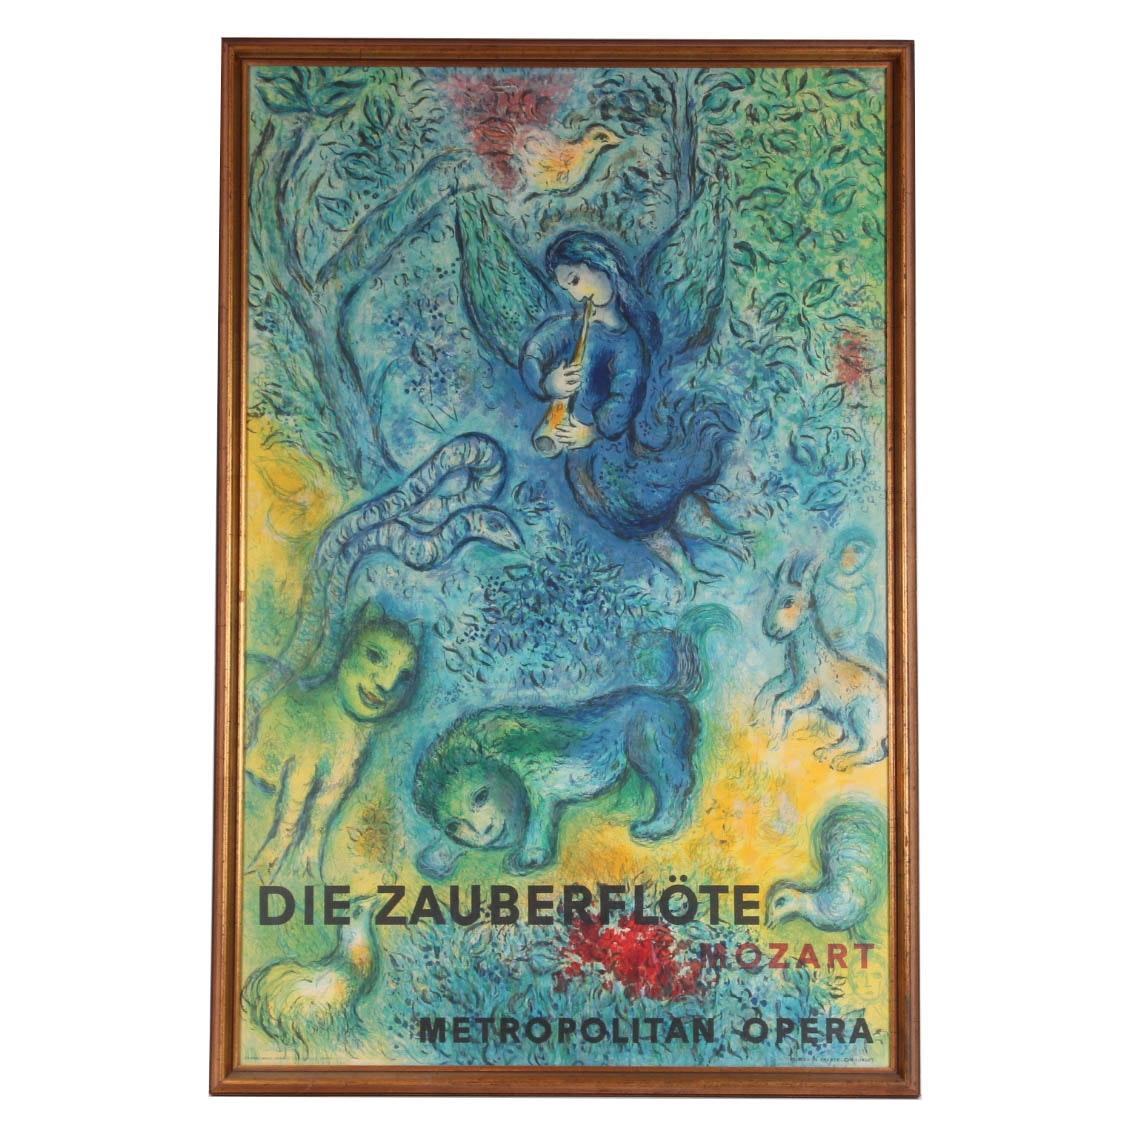 Chagall Die Zauberflote Metropolitan Opera Poster